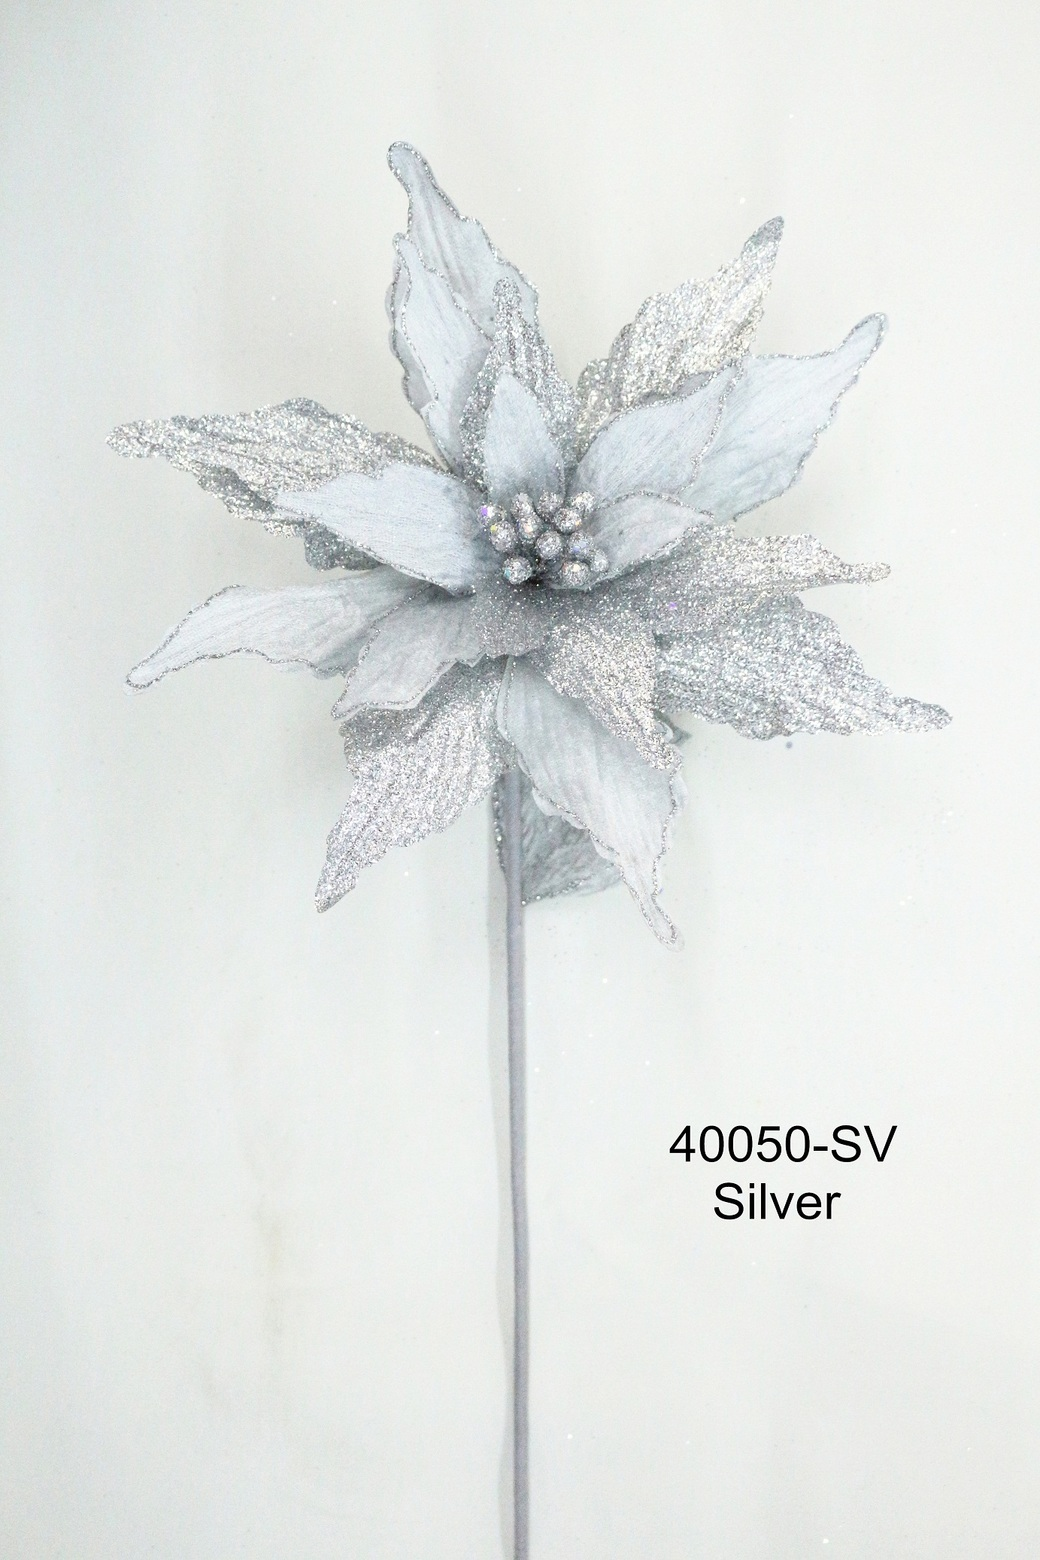 40050-SV